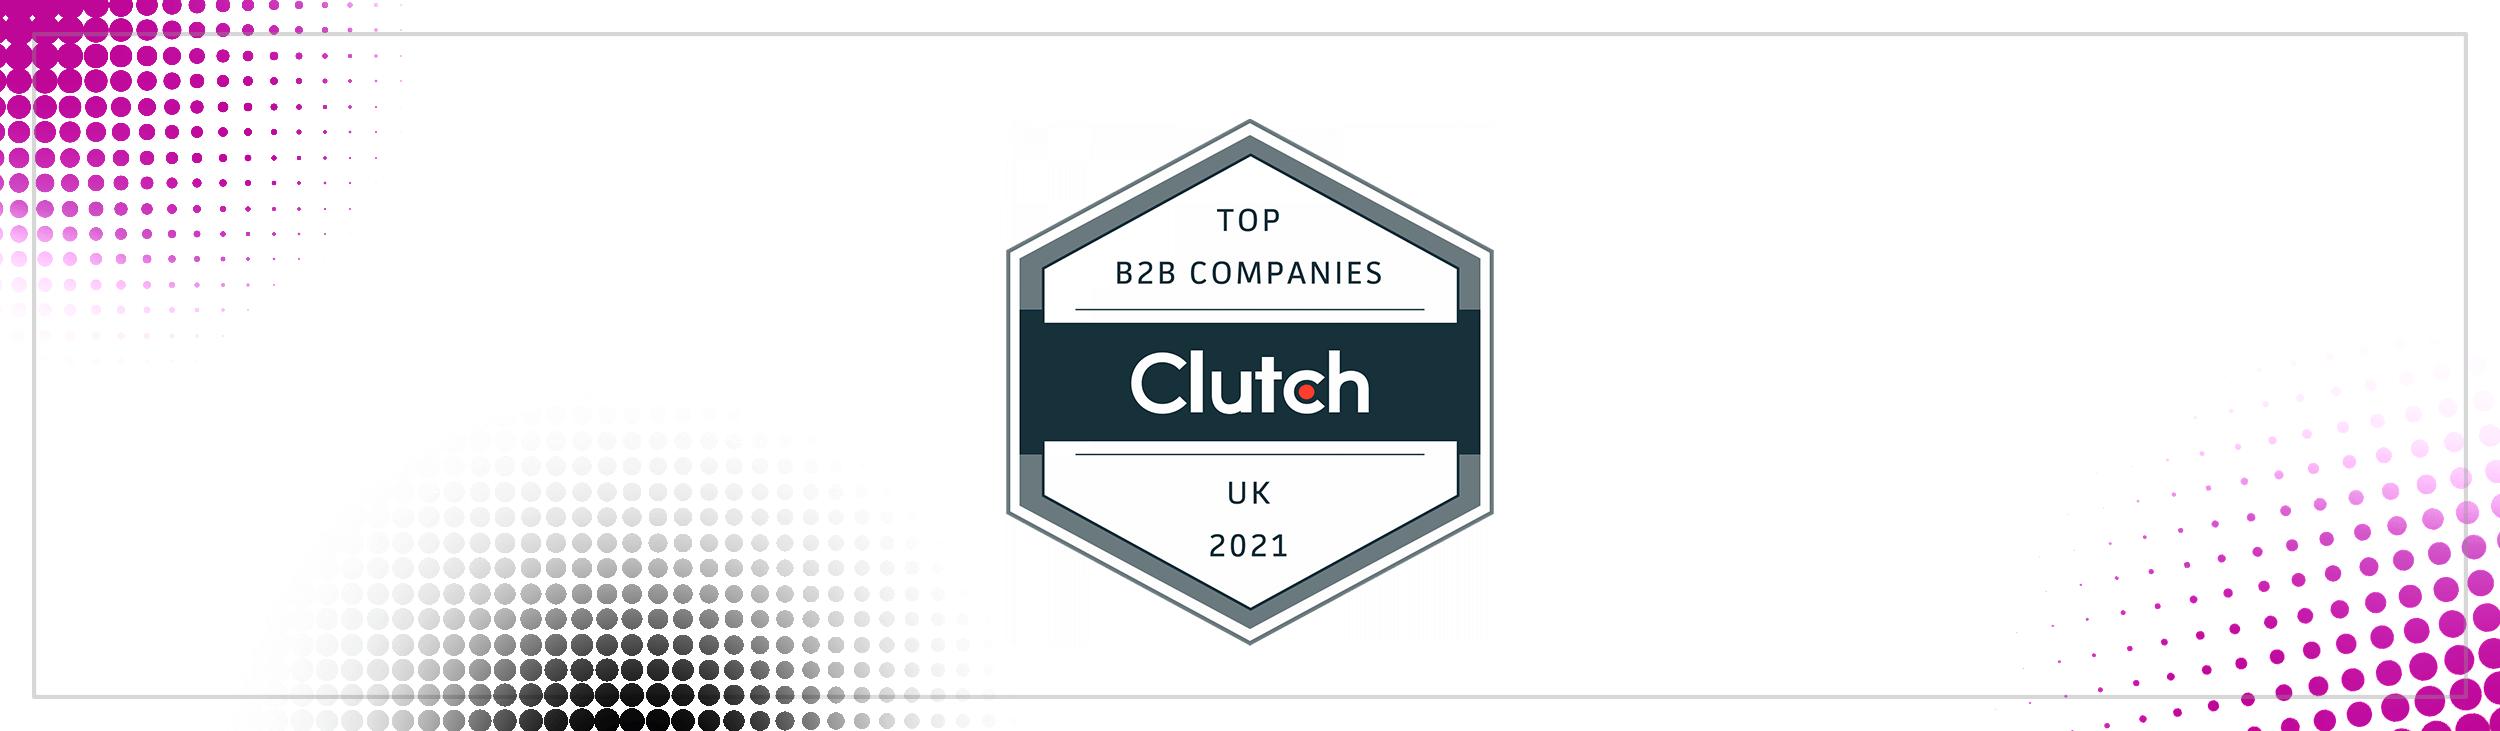 Clutch Top B2B Companies UK 2021